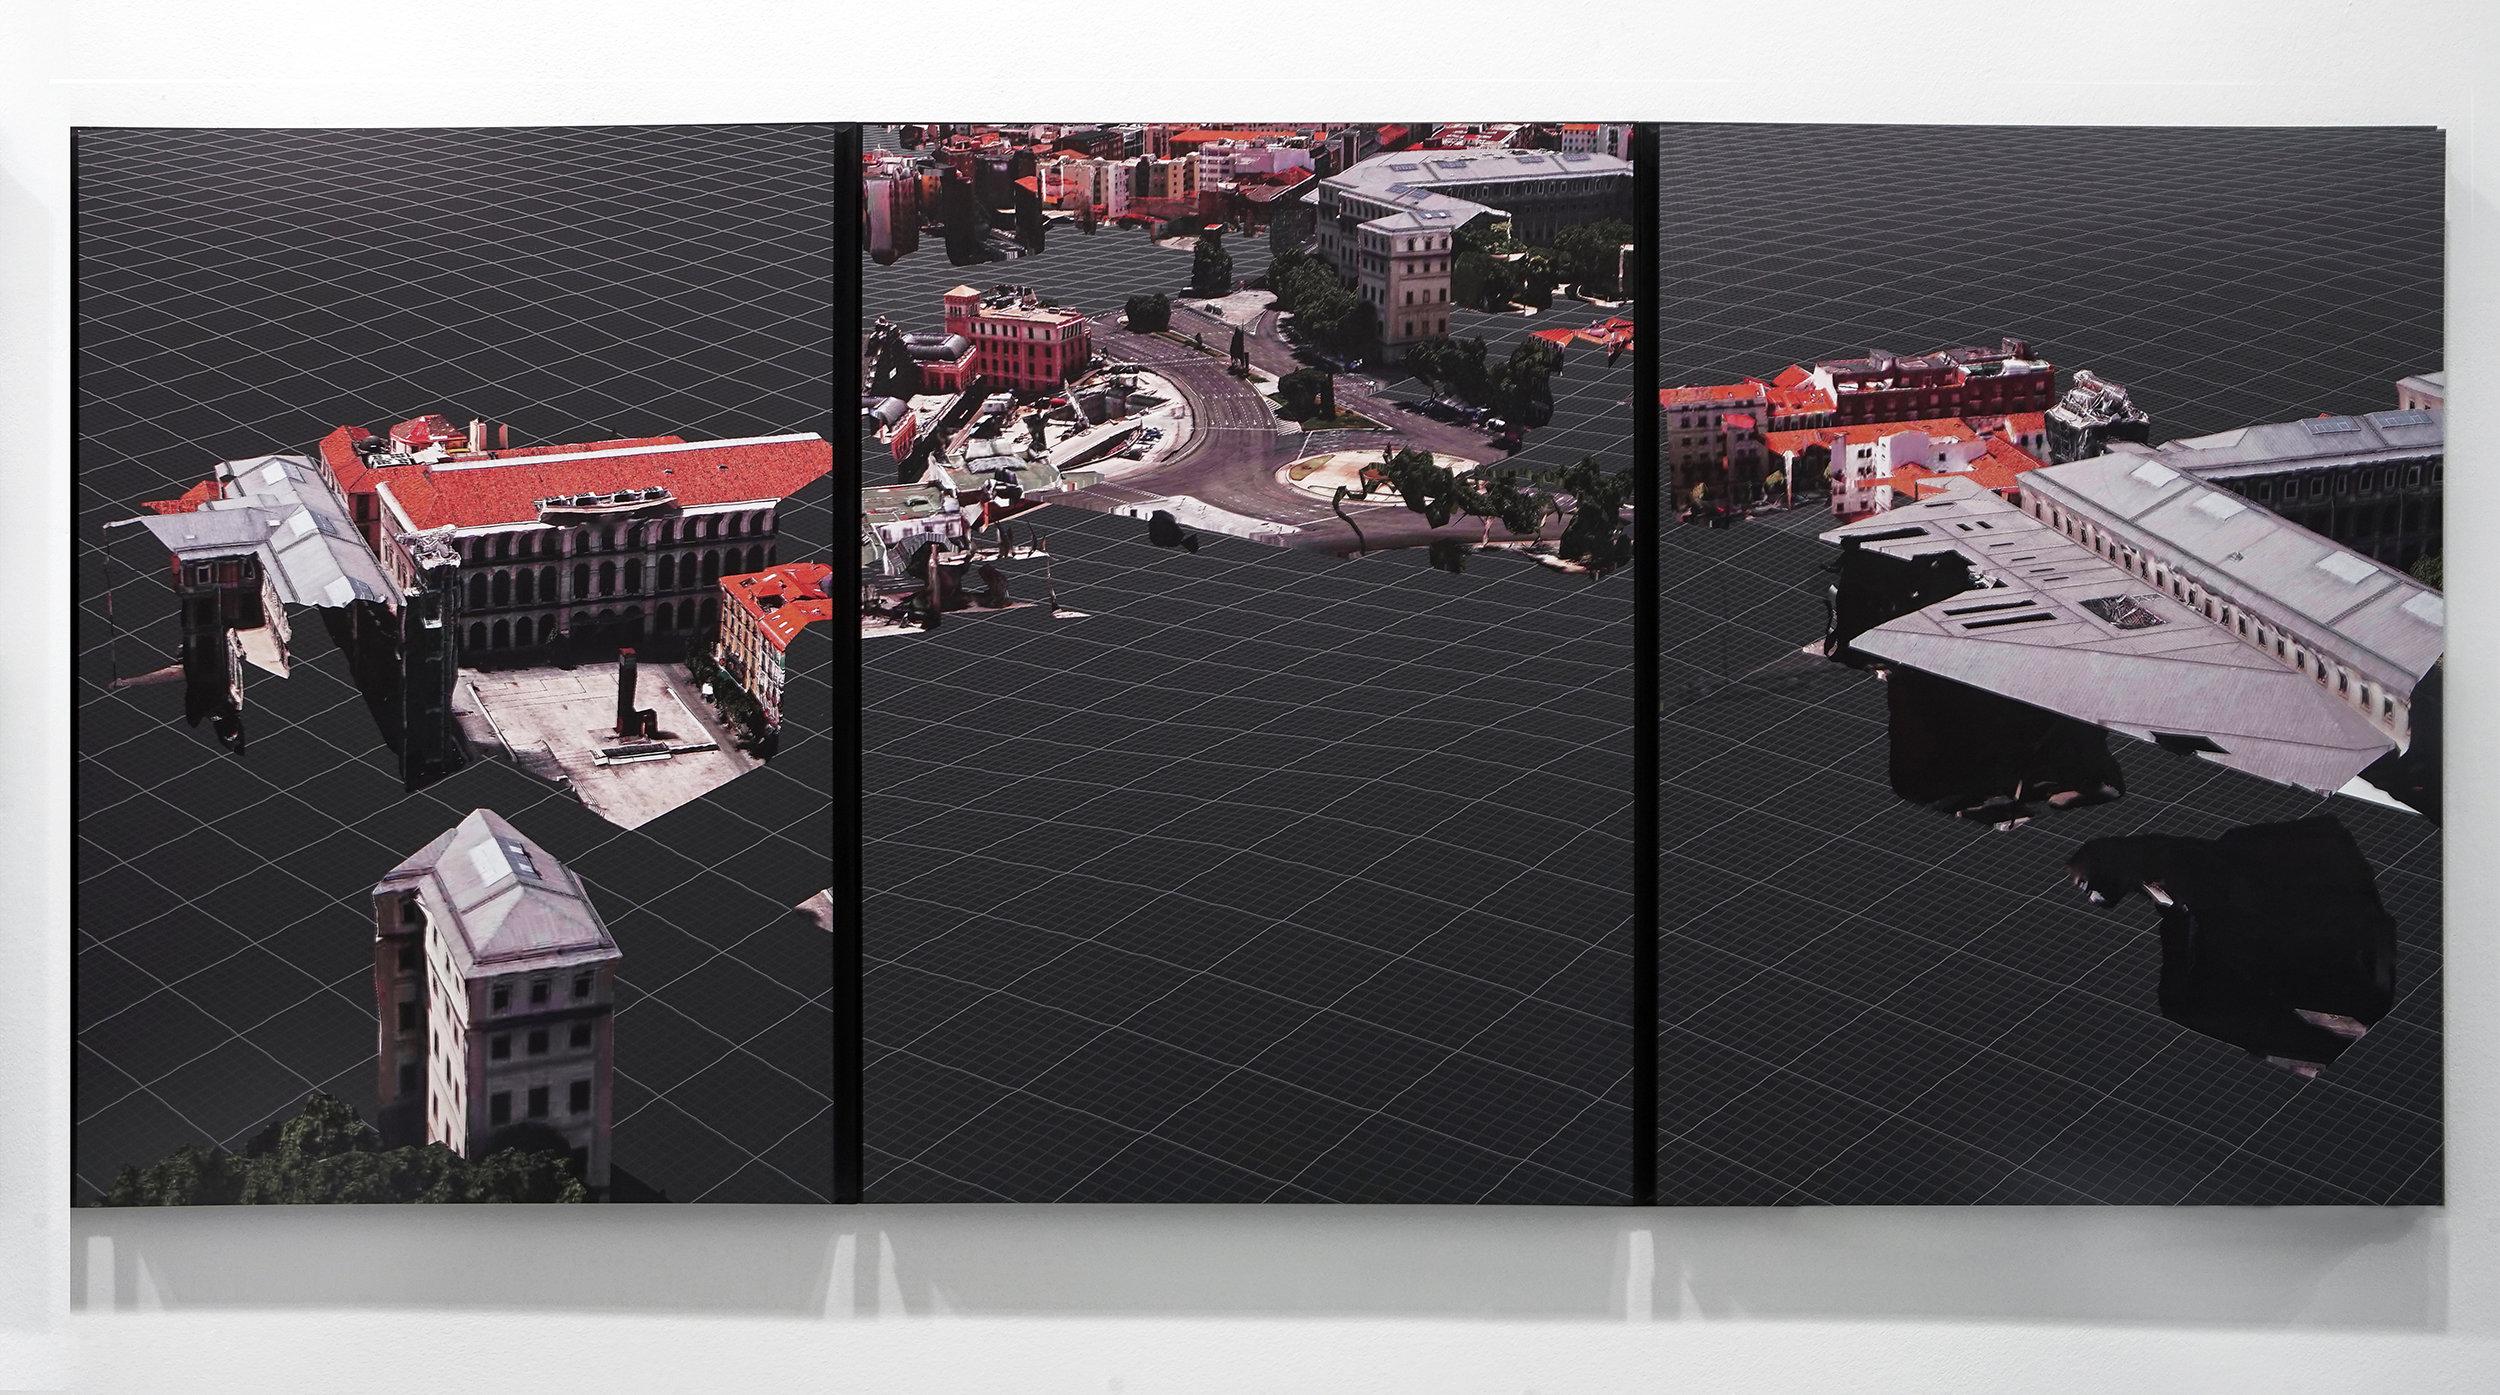 Triggered Glitches_MAD Reina (triptych), 2017  1800 X 840mm _ Digital image printed on Dibond